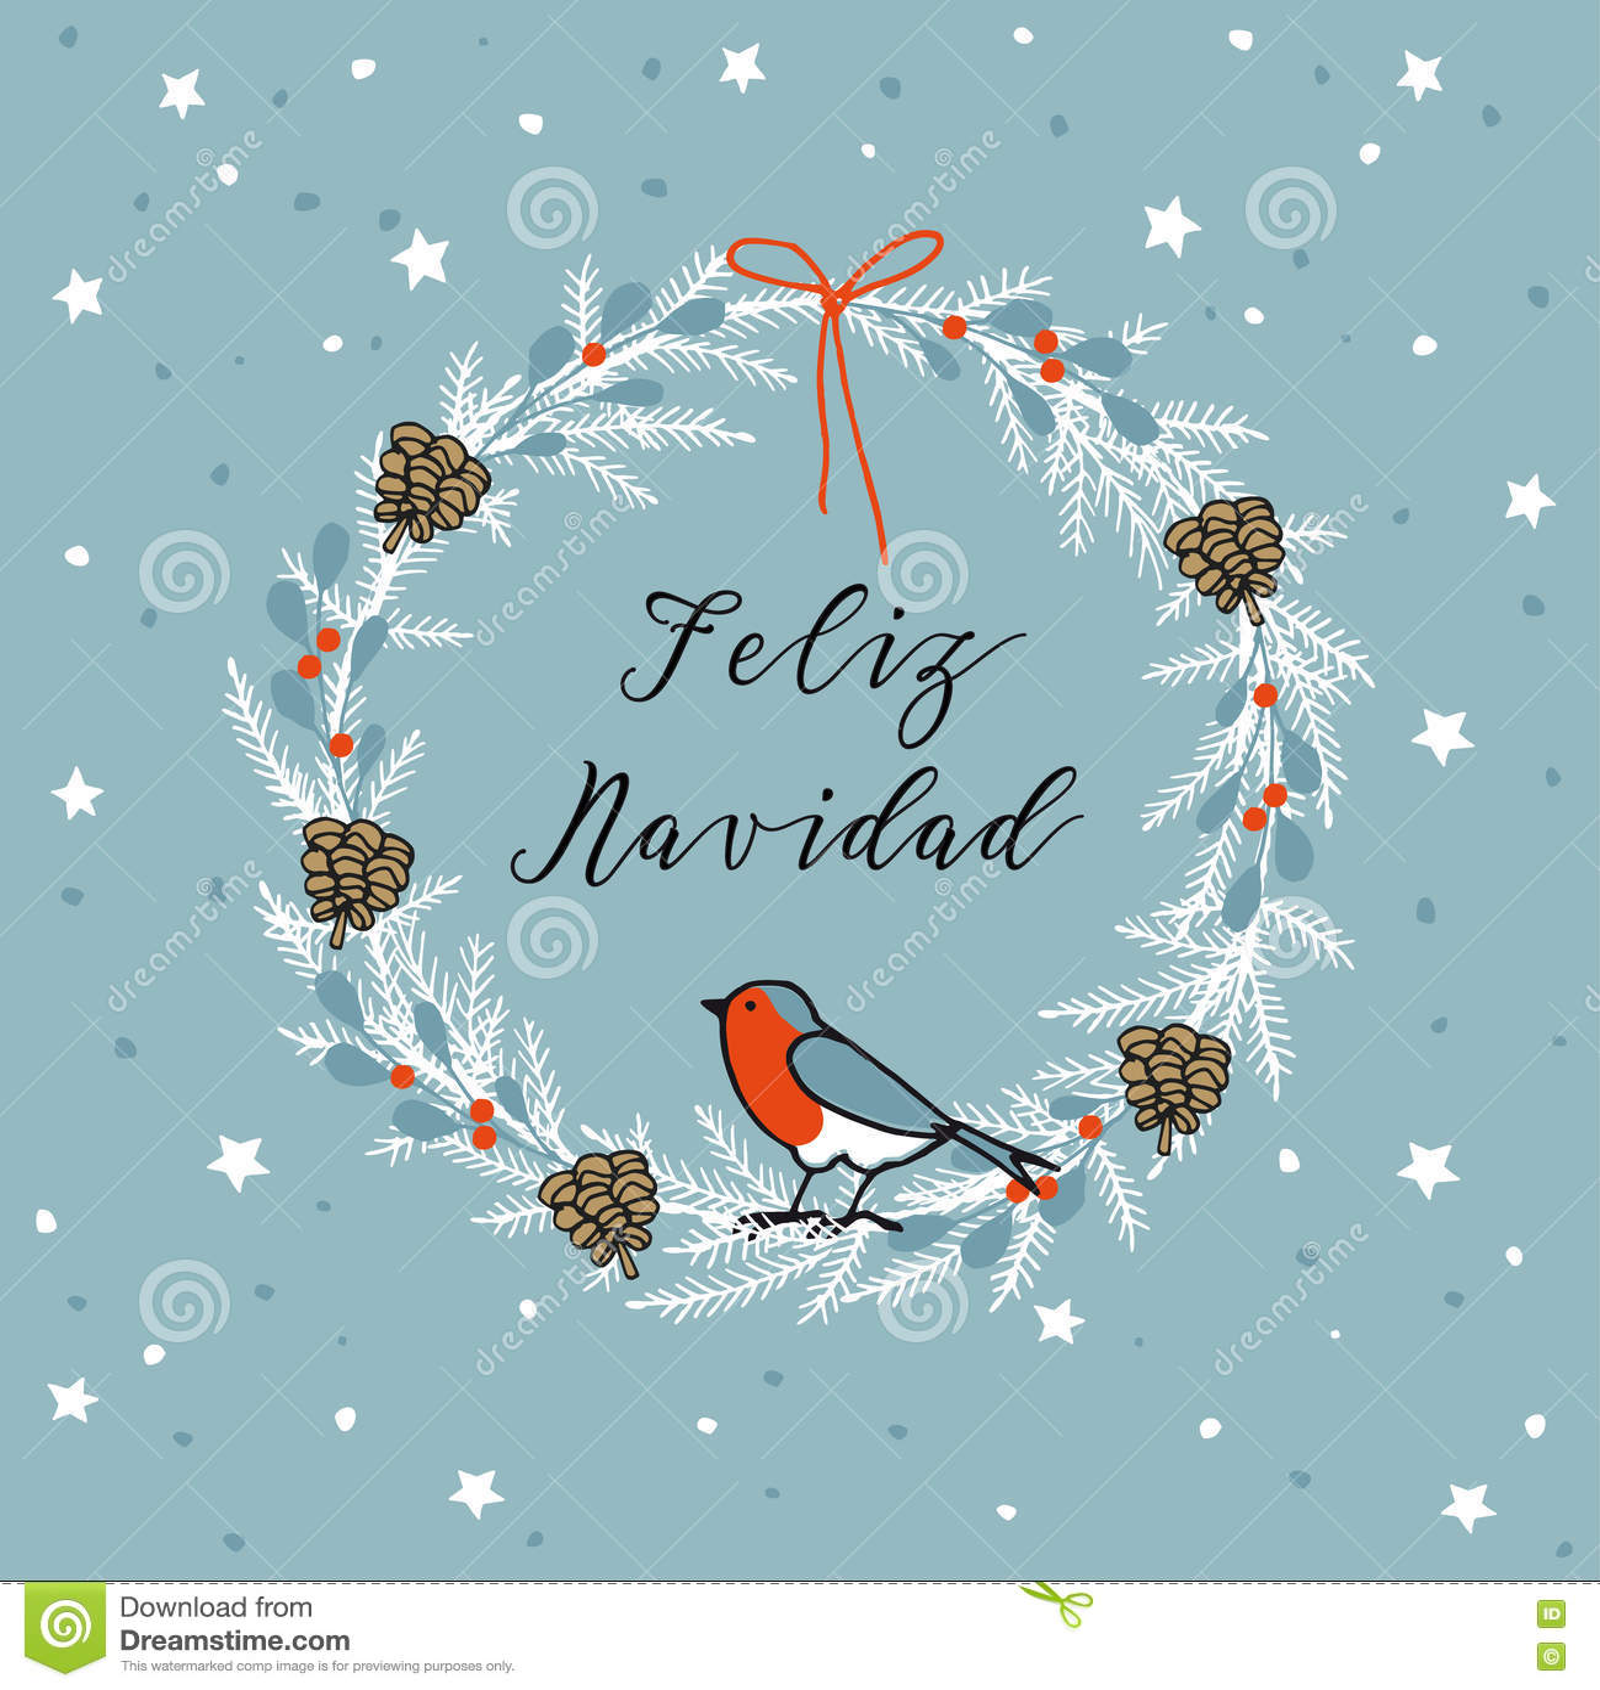 joyeux no l de vintage carte de voeux de feliz navidad d 39 espagnol invitation guirlande faite. Black Bedroom Furniture Sets. Home Design Ideas